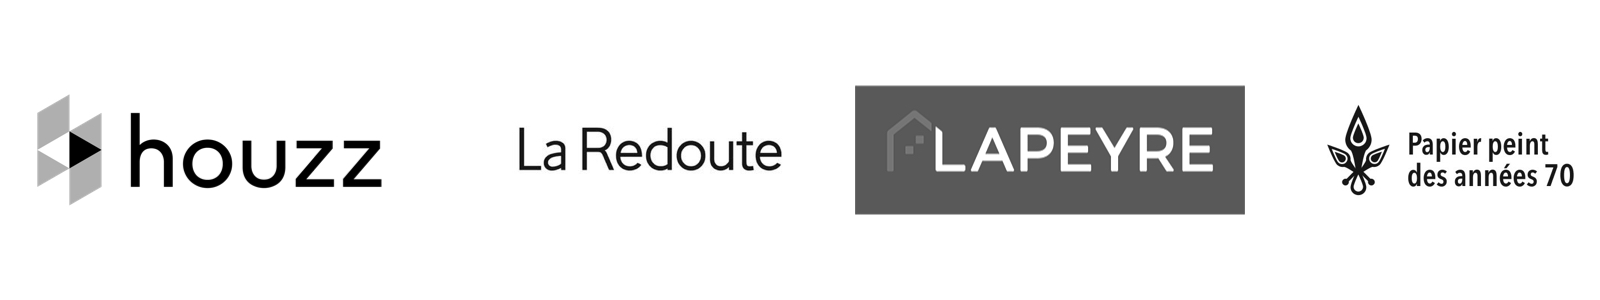 projet communication decoration maison